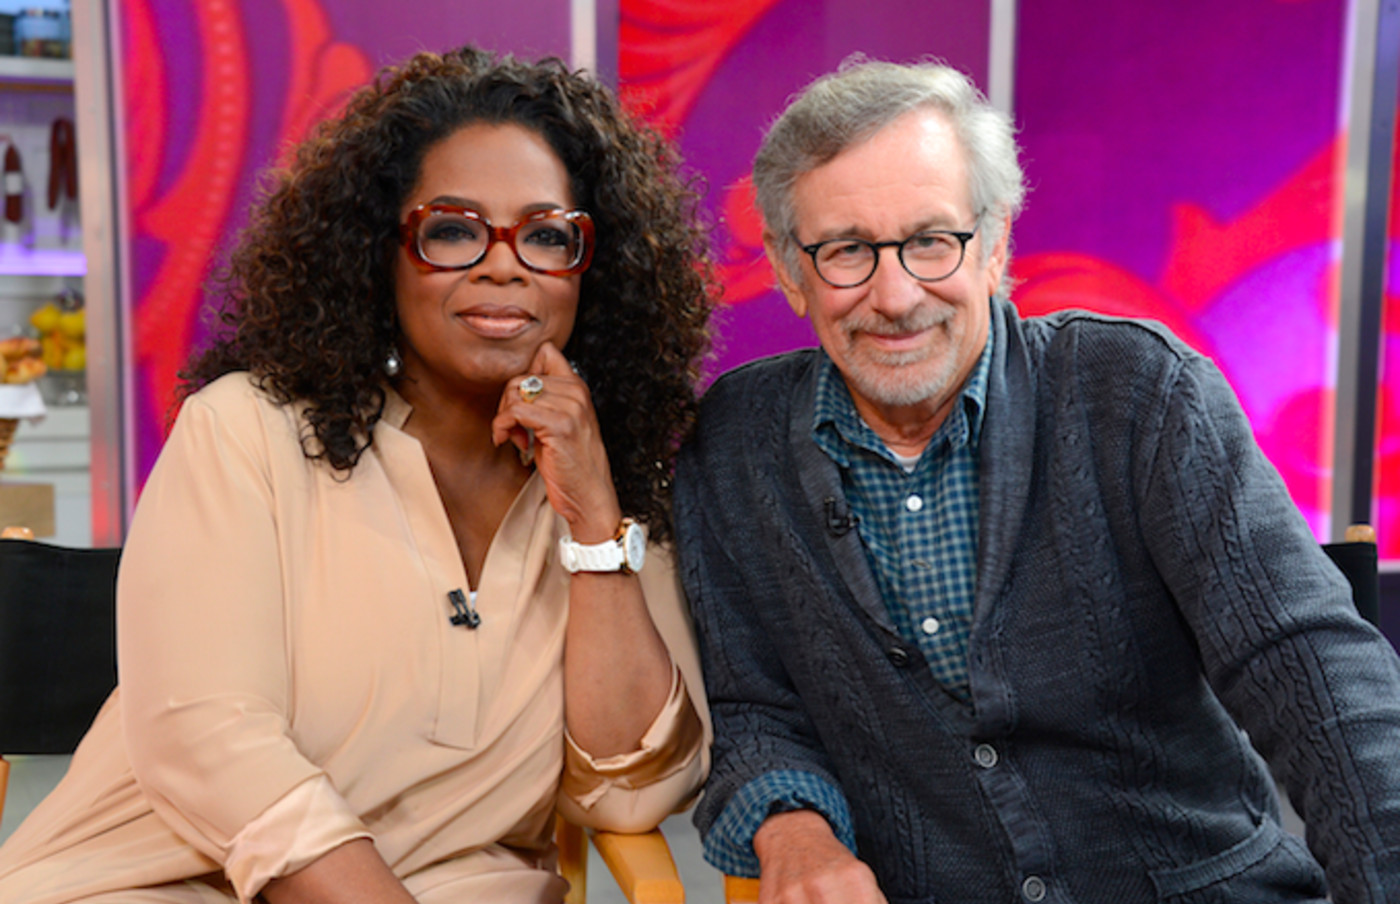 Oprah and Steven Spielberg